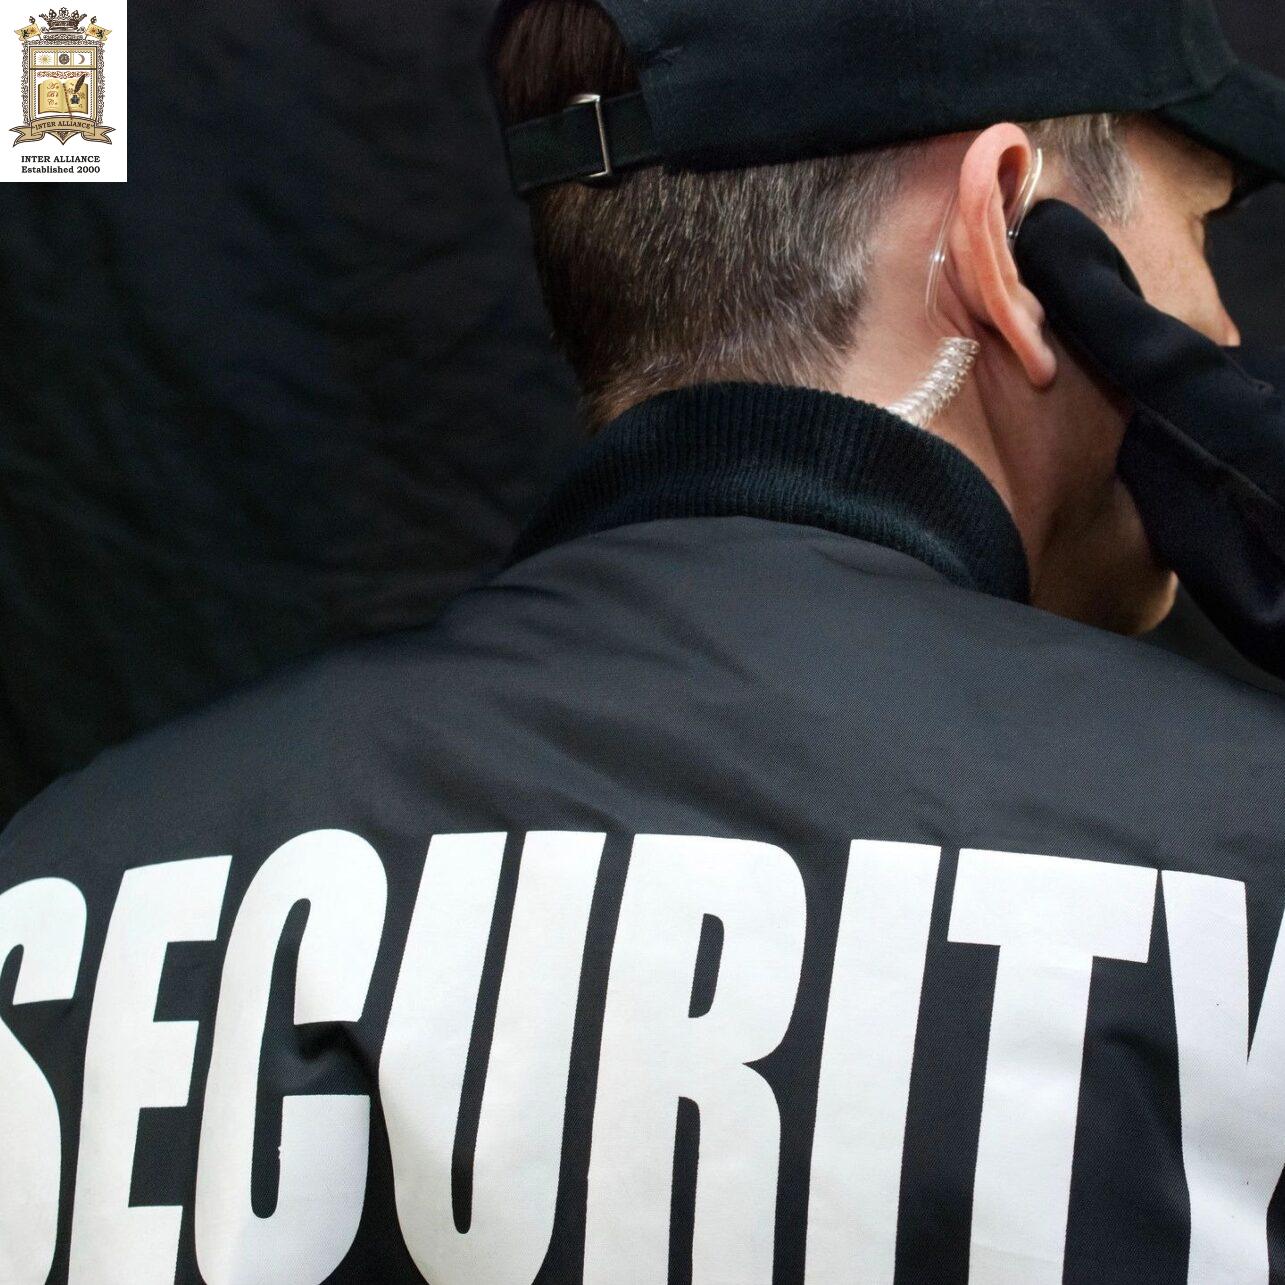 Курс по Физическа Охрана Бодигард, ИНКАСО, Сигурност от 1-во до 3-то Ниво от INTER ALLIANCE